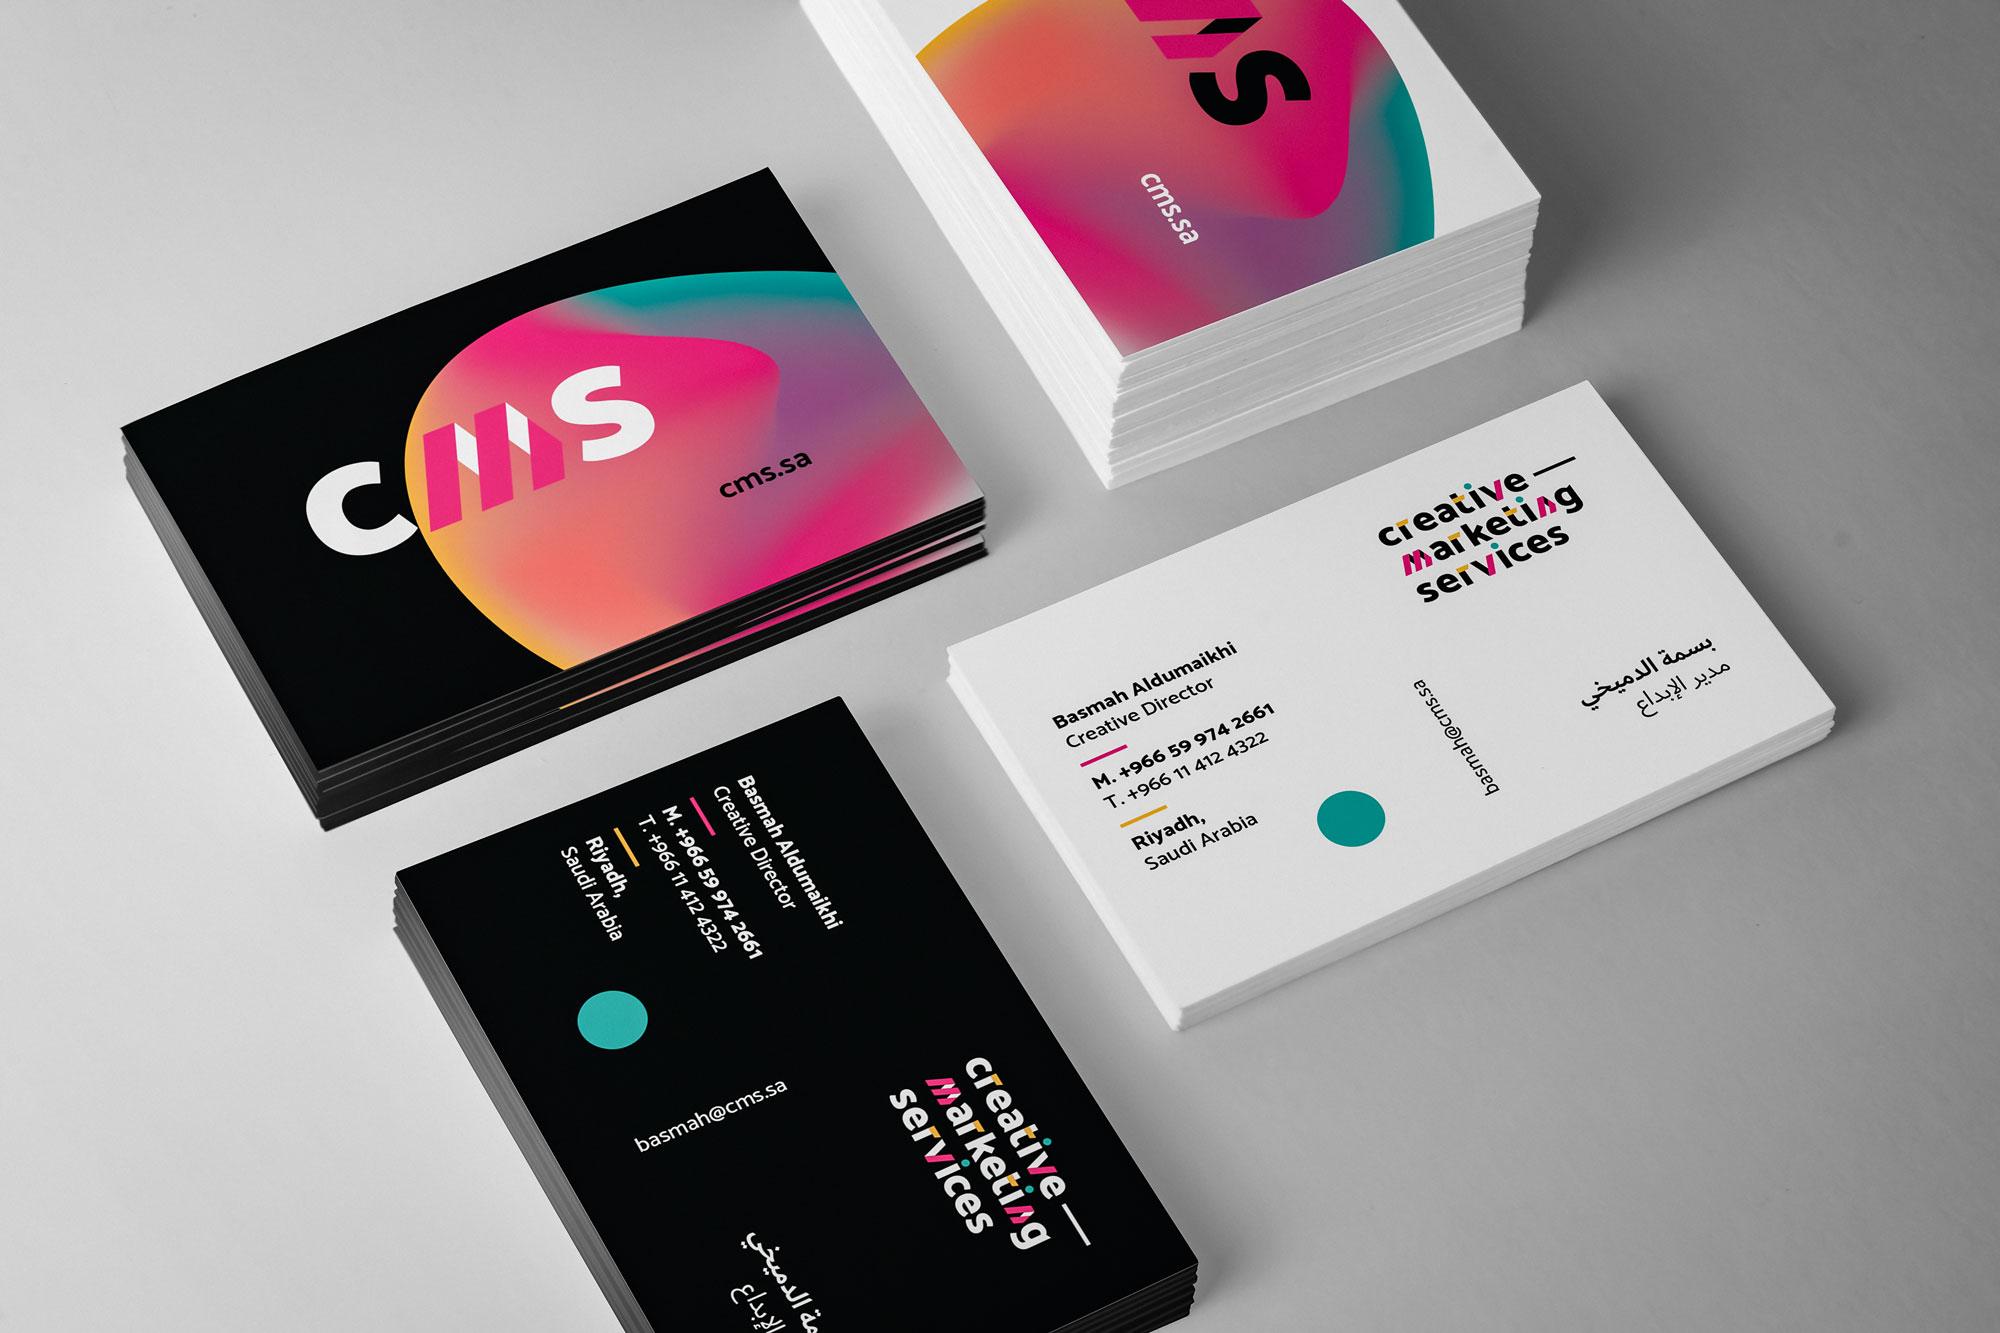 cms-bc-01-by-yastudio